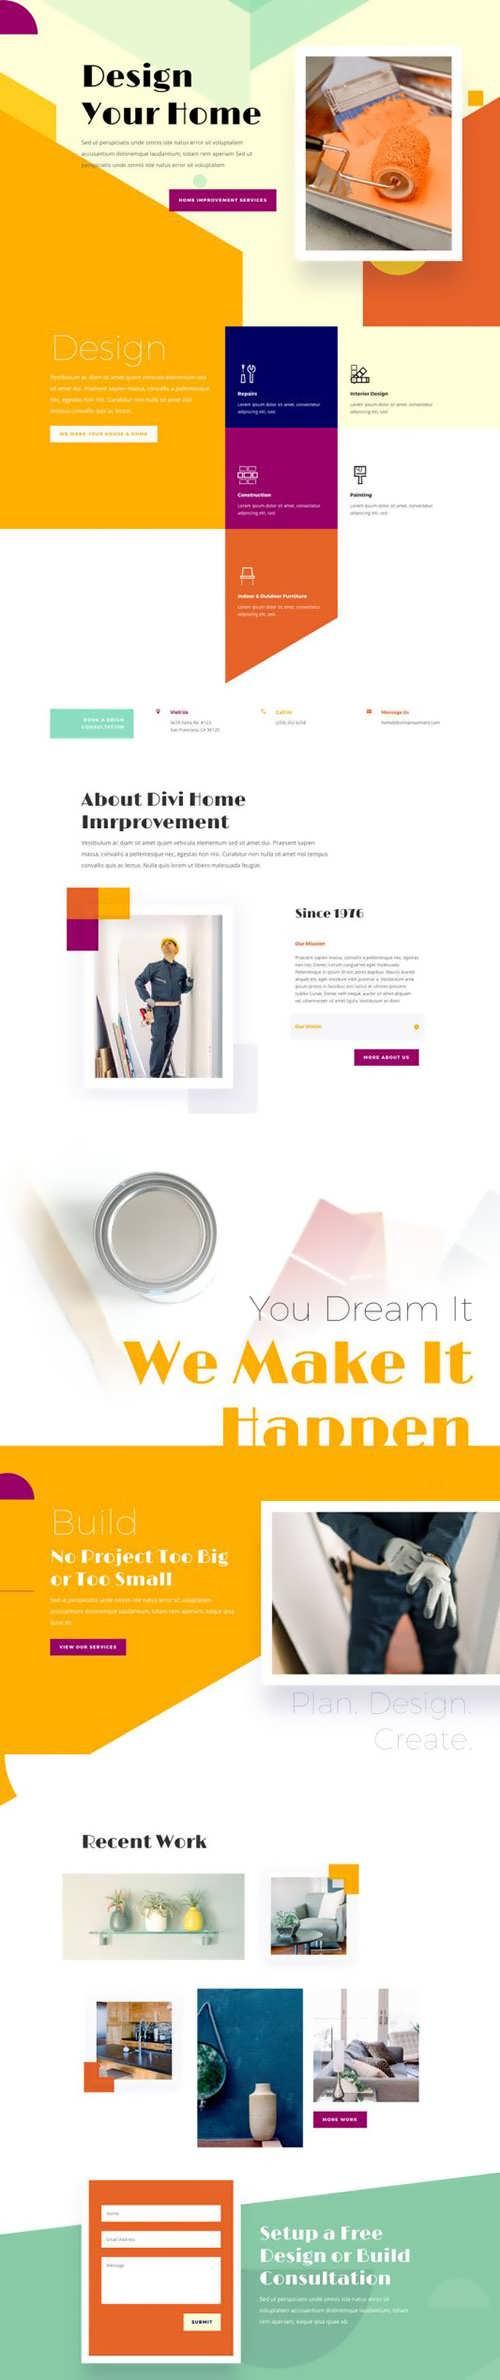 home improvement landing page